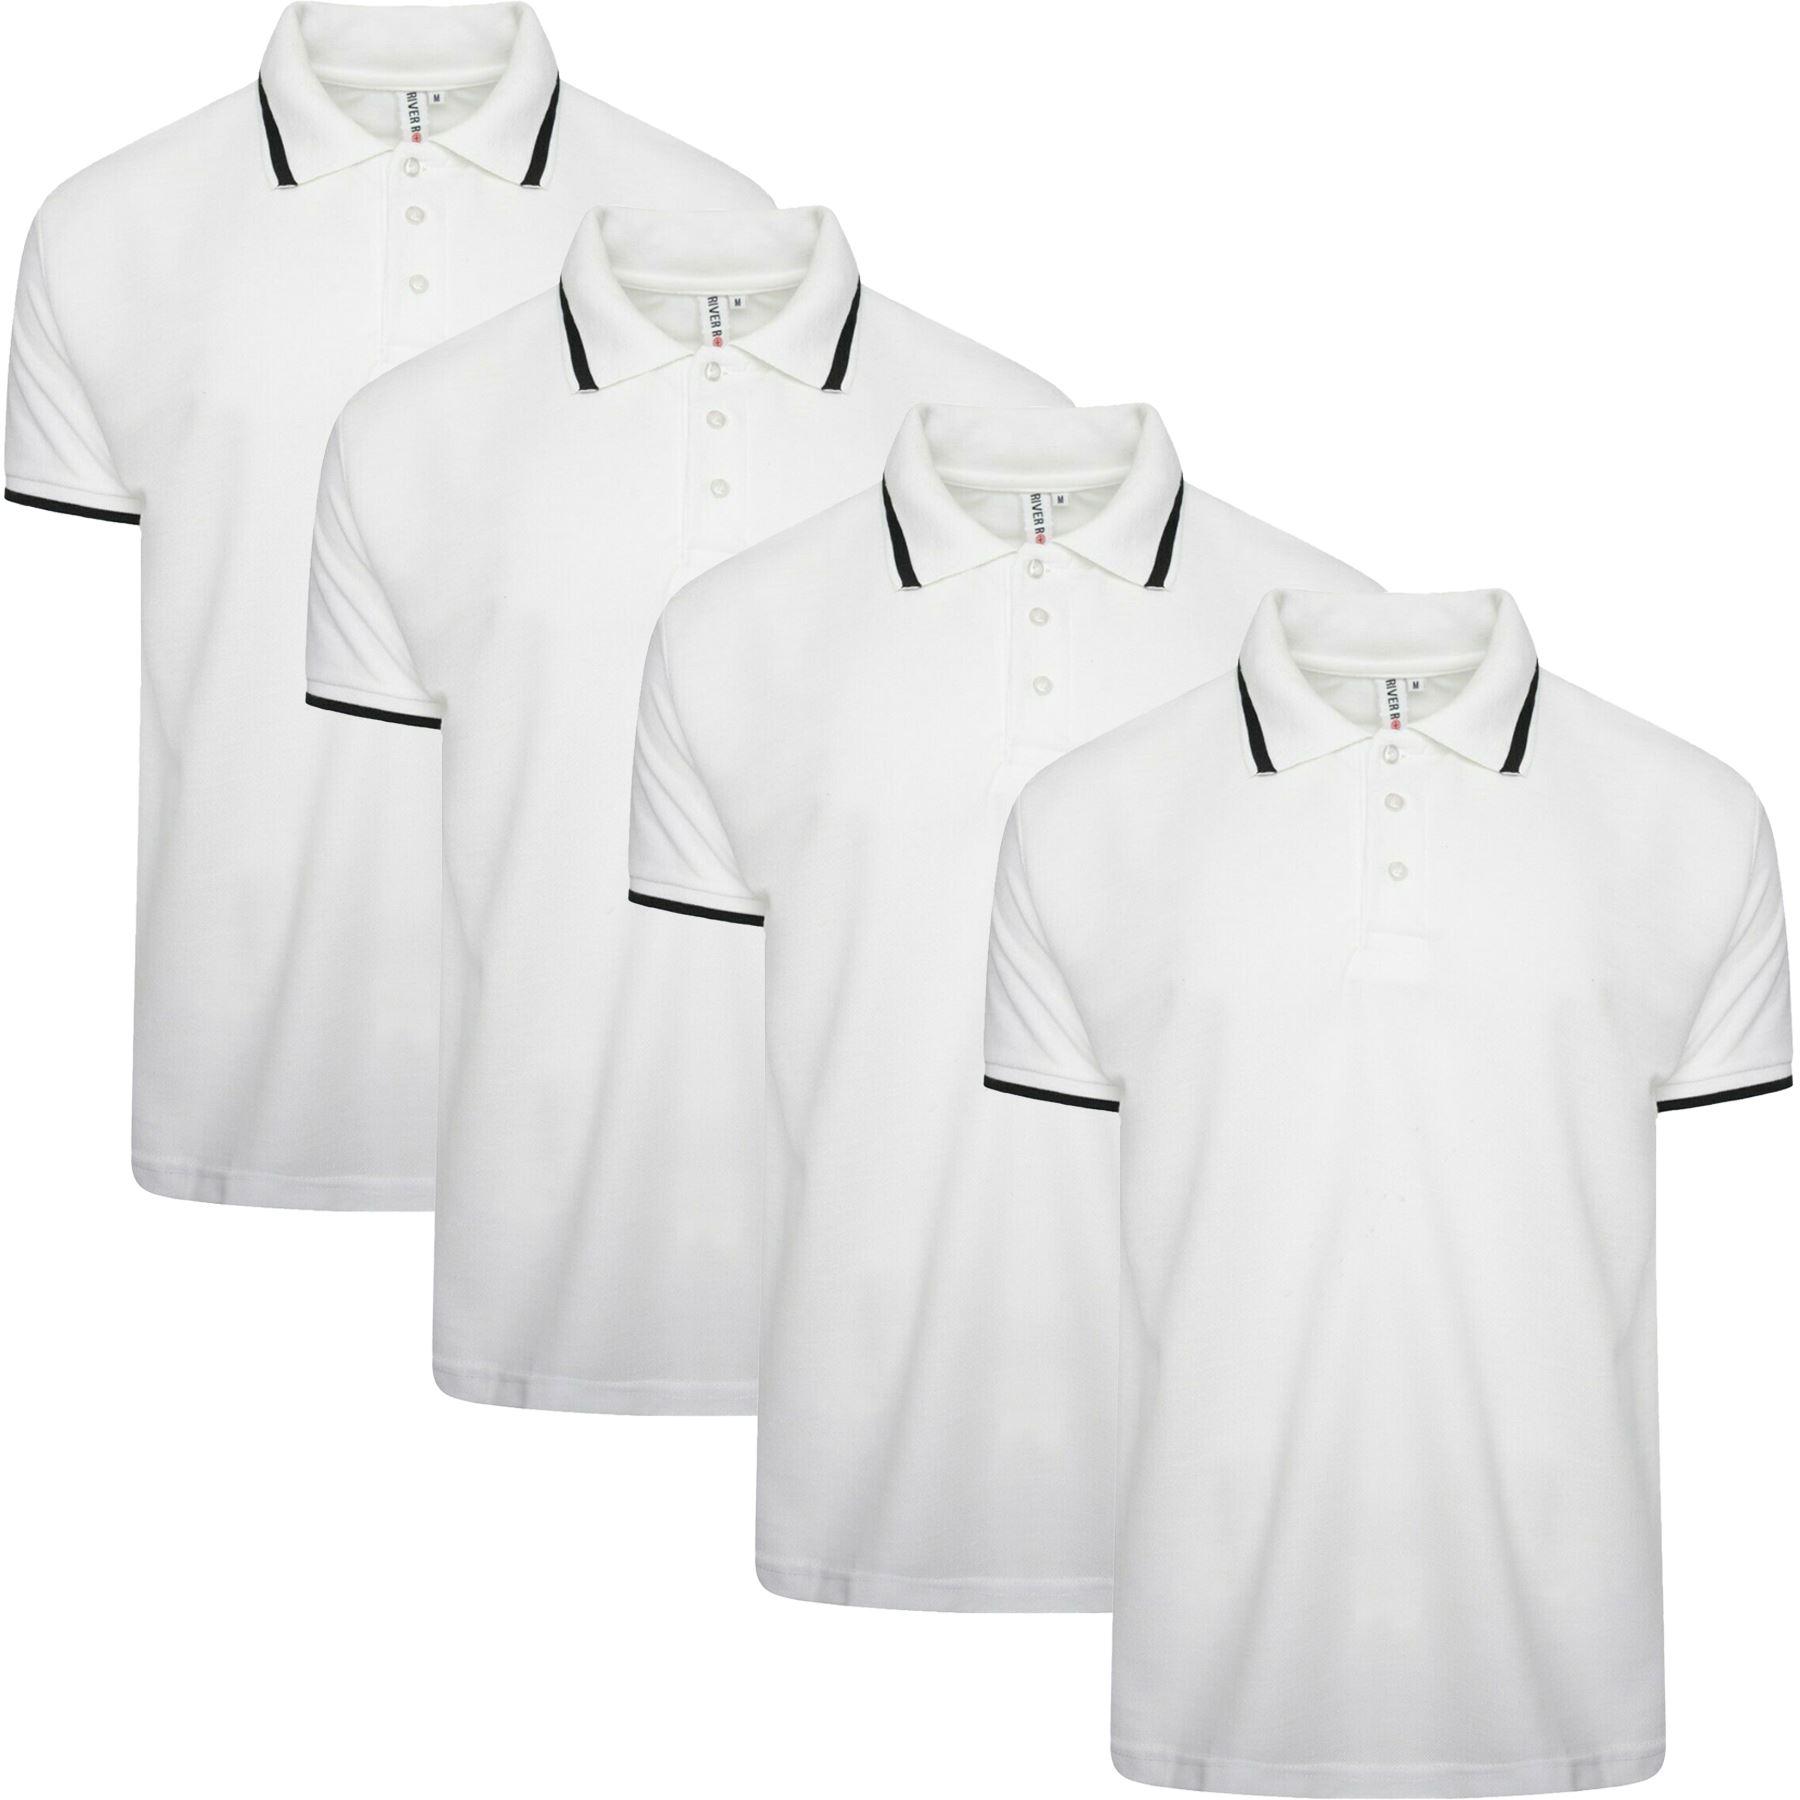 New Pack of 4 Mens Polo Shirt Short Sleeve Plain Pique Top Designer Tshirt Tee